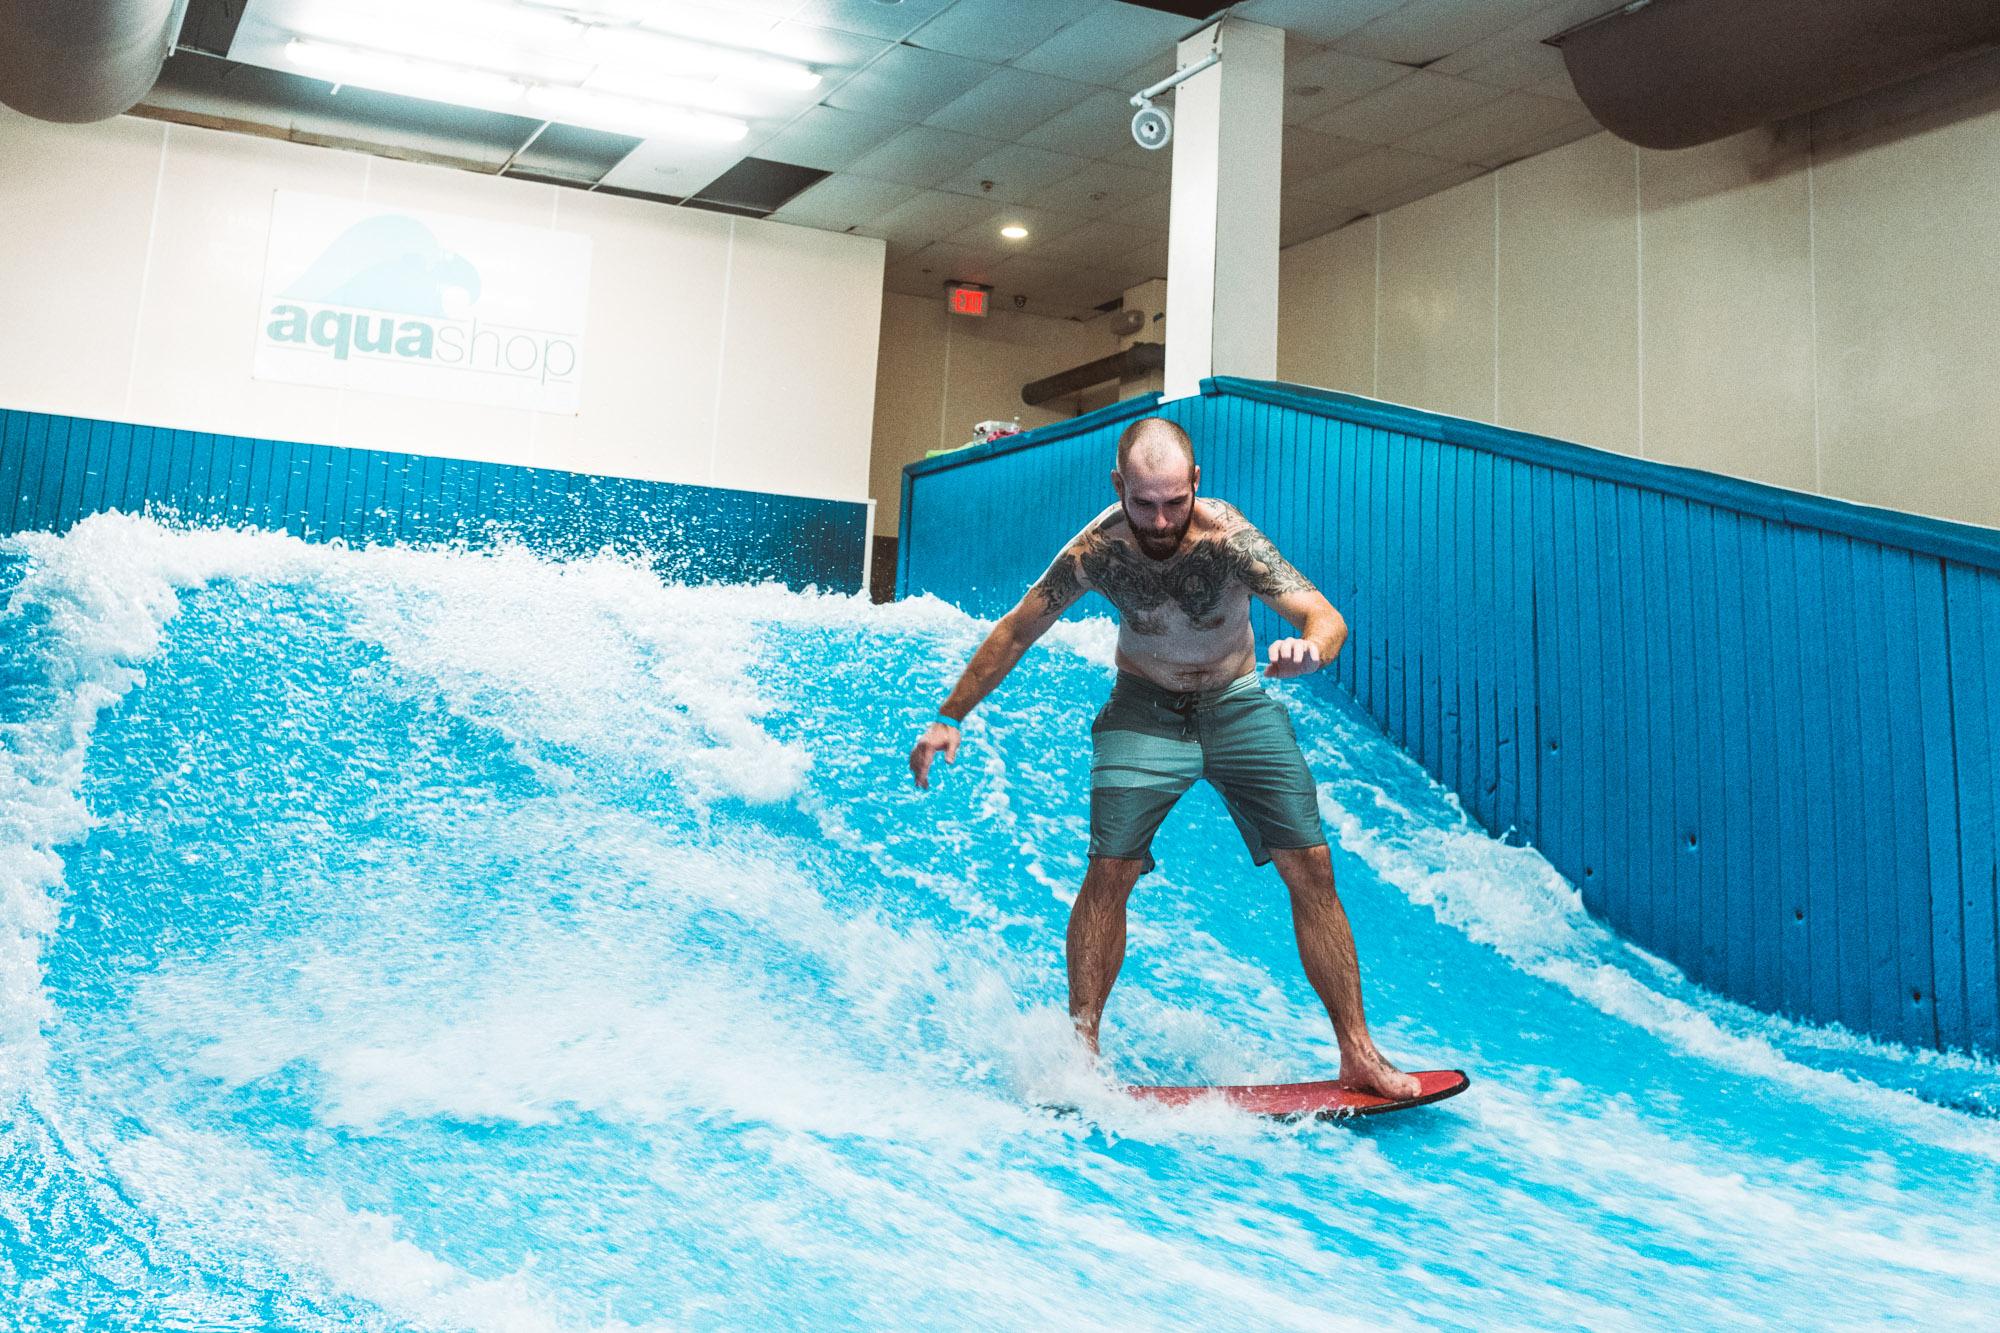 Bob Flowboarding